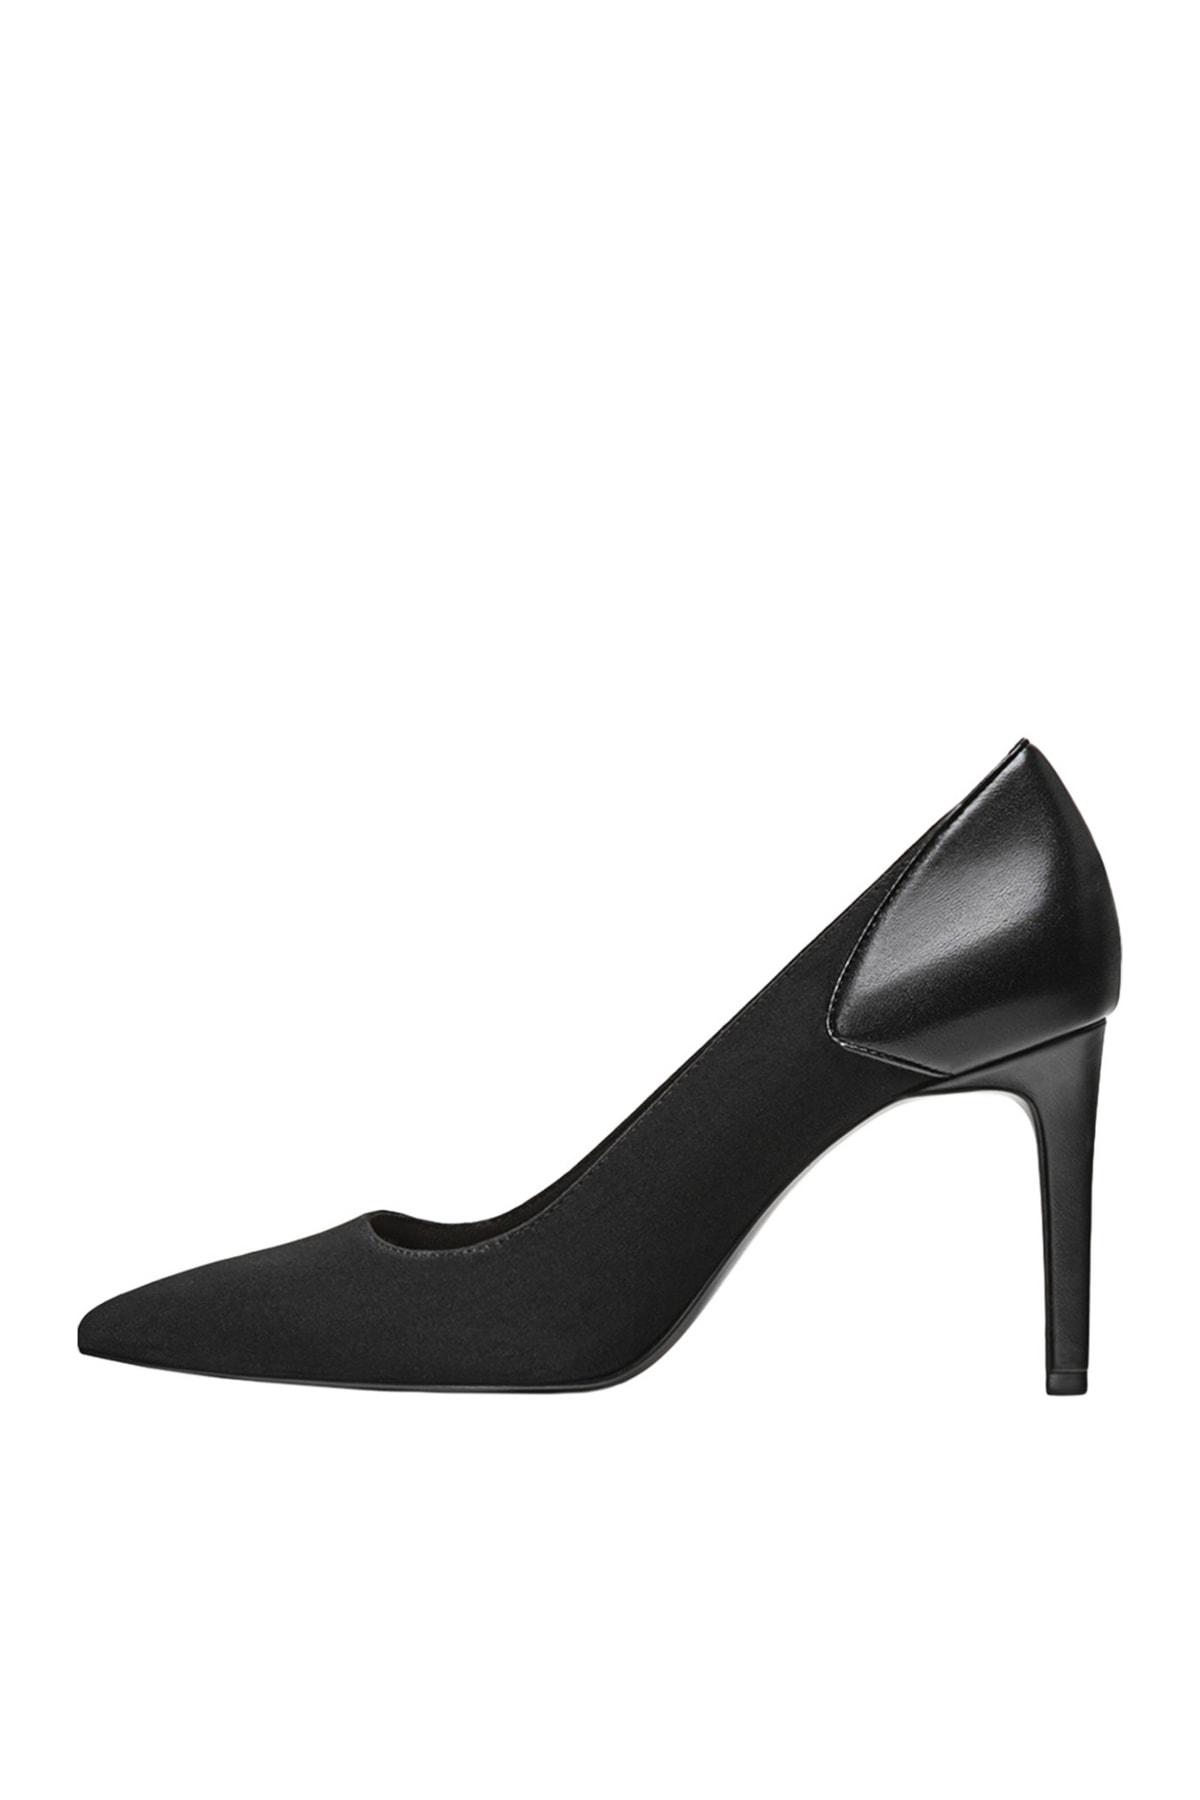 Stradivarius Kadın Siyah Yüksek Topuklu Kontrast Ayakkabı 19650670 1